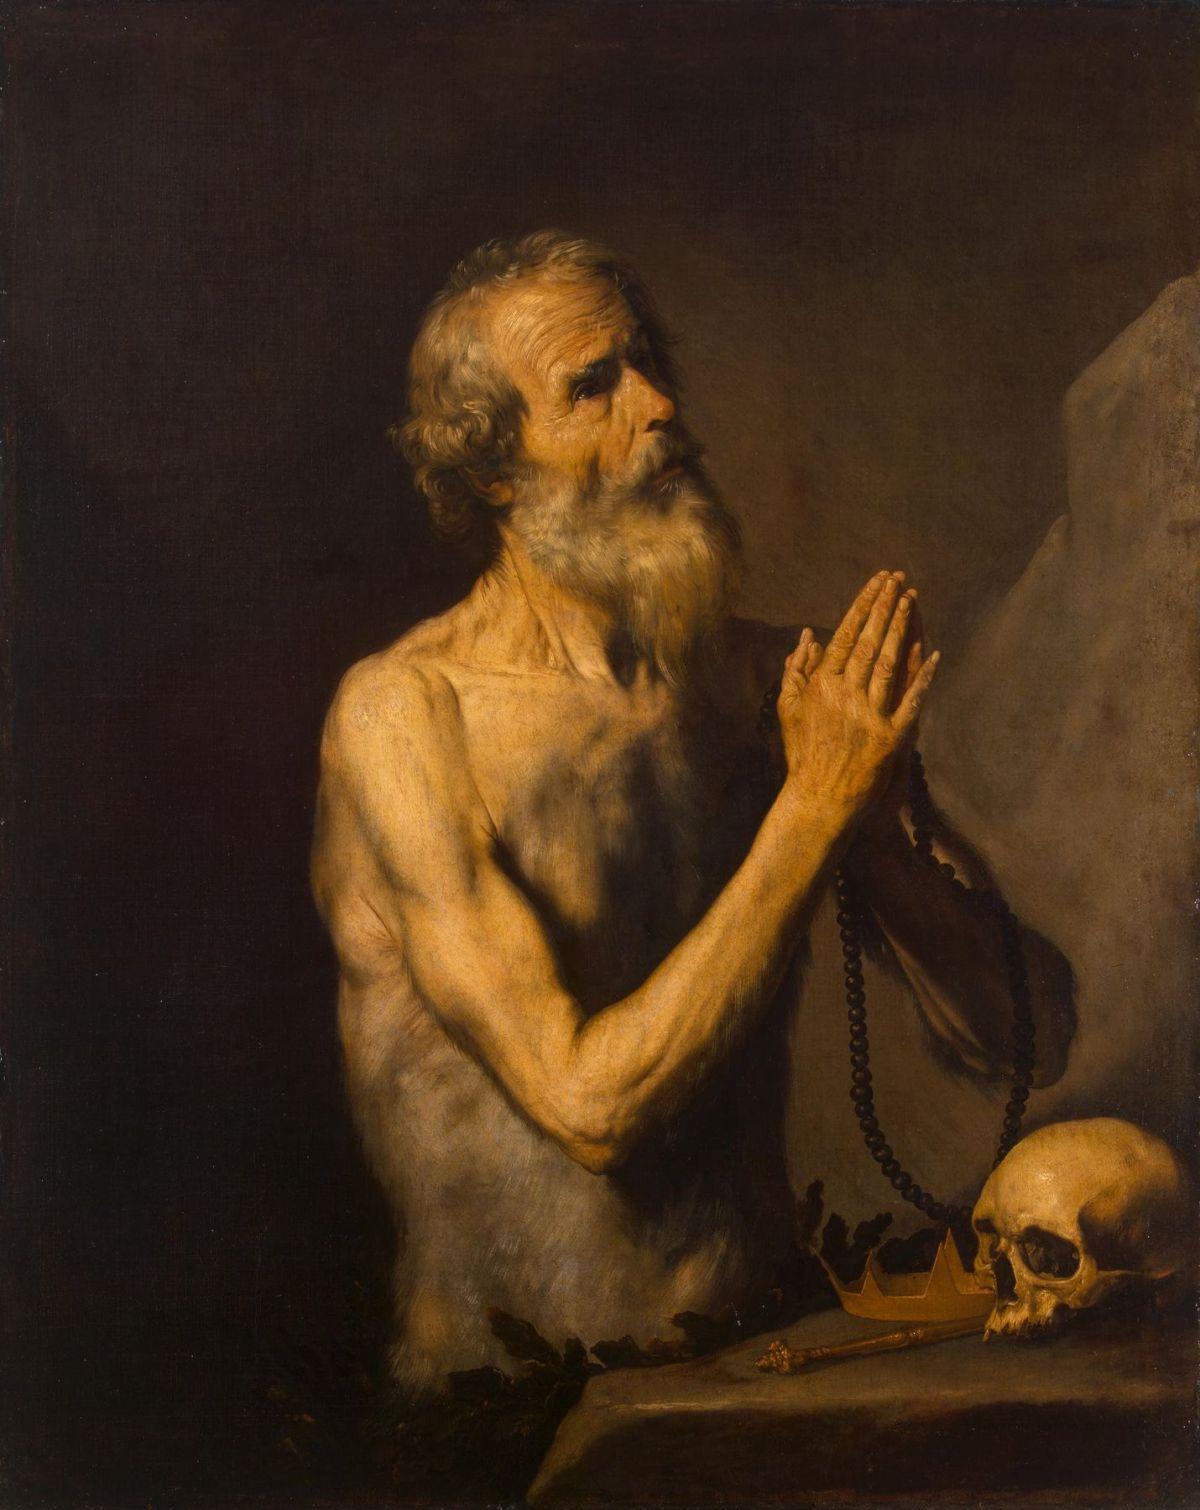 St Onuphrius by Jusepe de Ribera